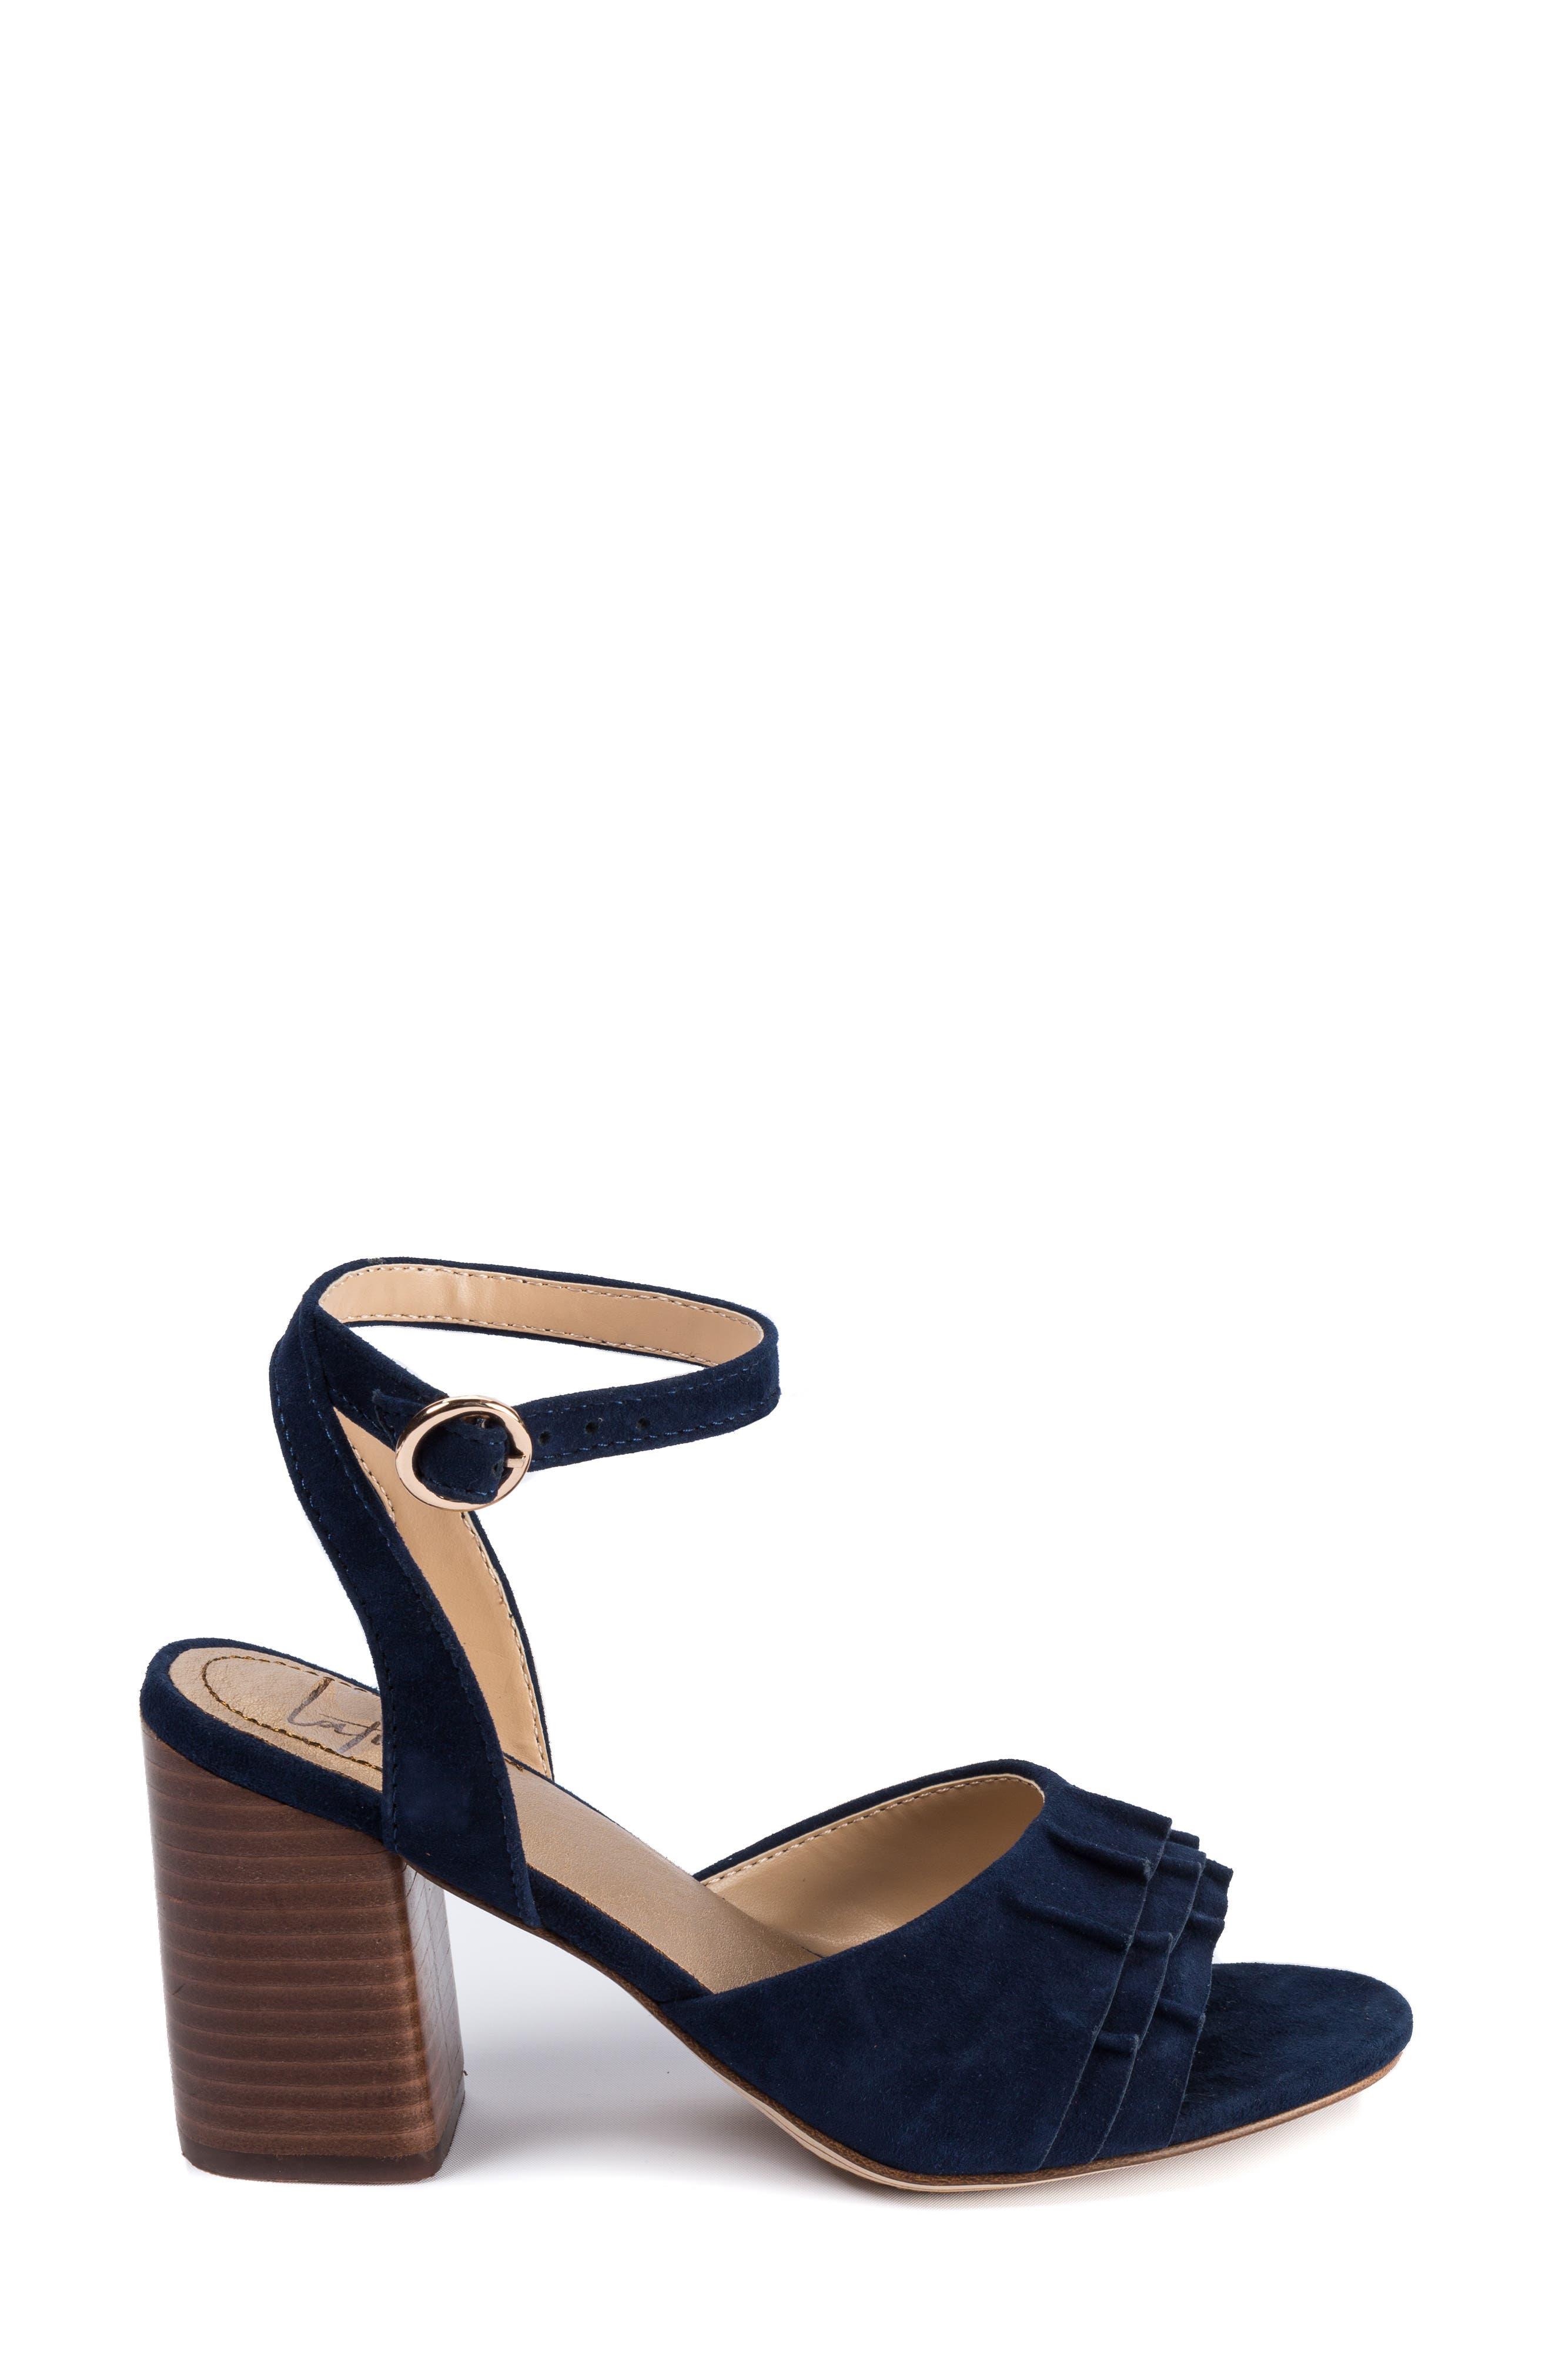 LATIGO, Idelle Ankle Strap Sandal, Alternate thumbnail 3, color, 410